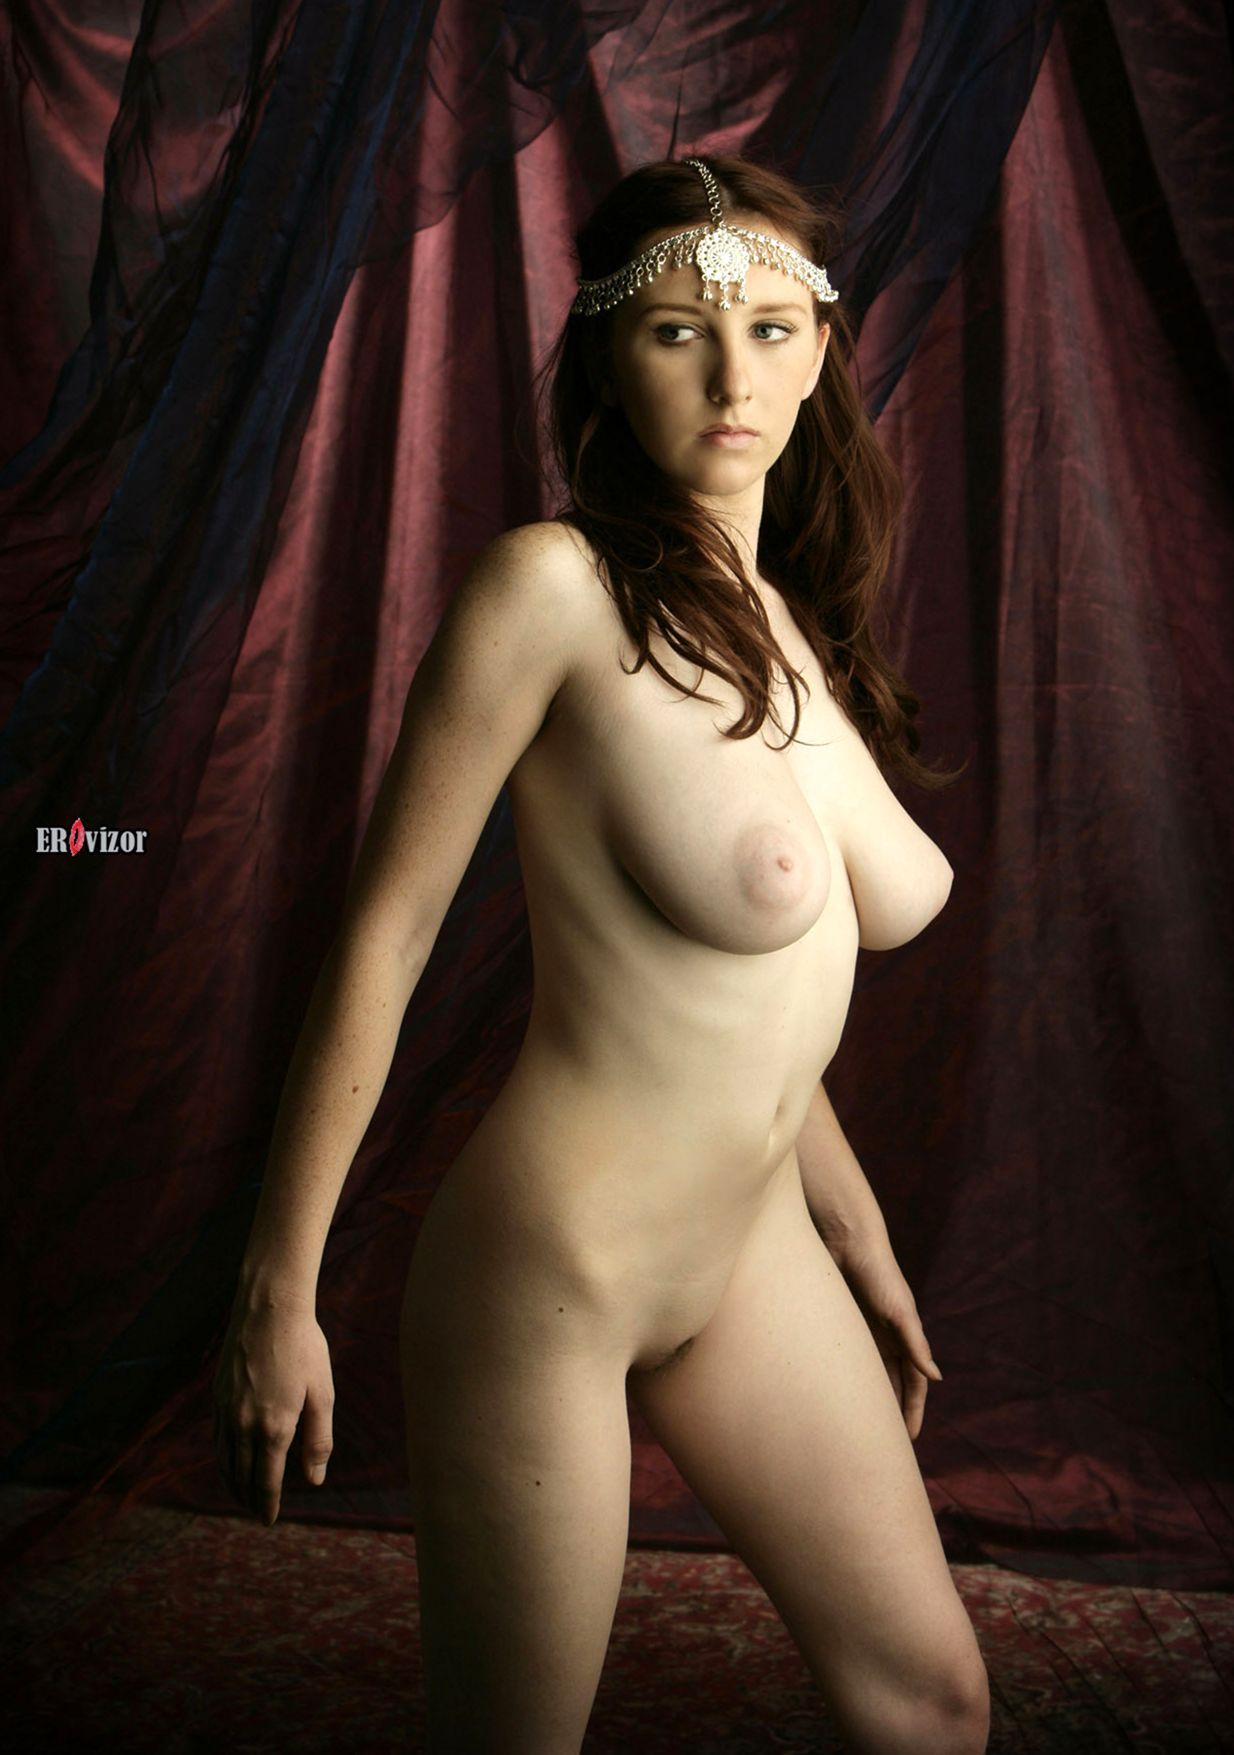 Brunette-Babe-Sarah-Of-Rafeynor-with-Big-Naturals-1